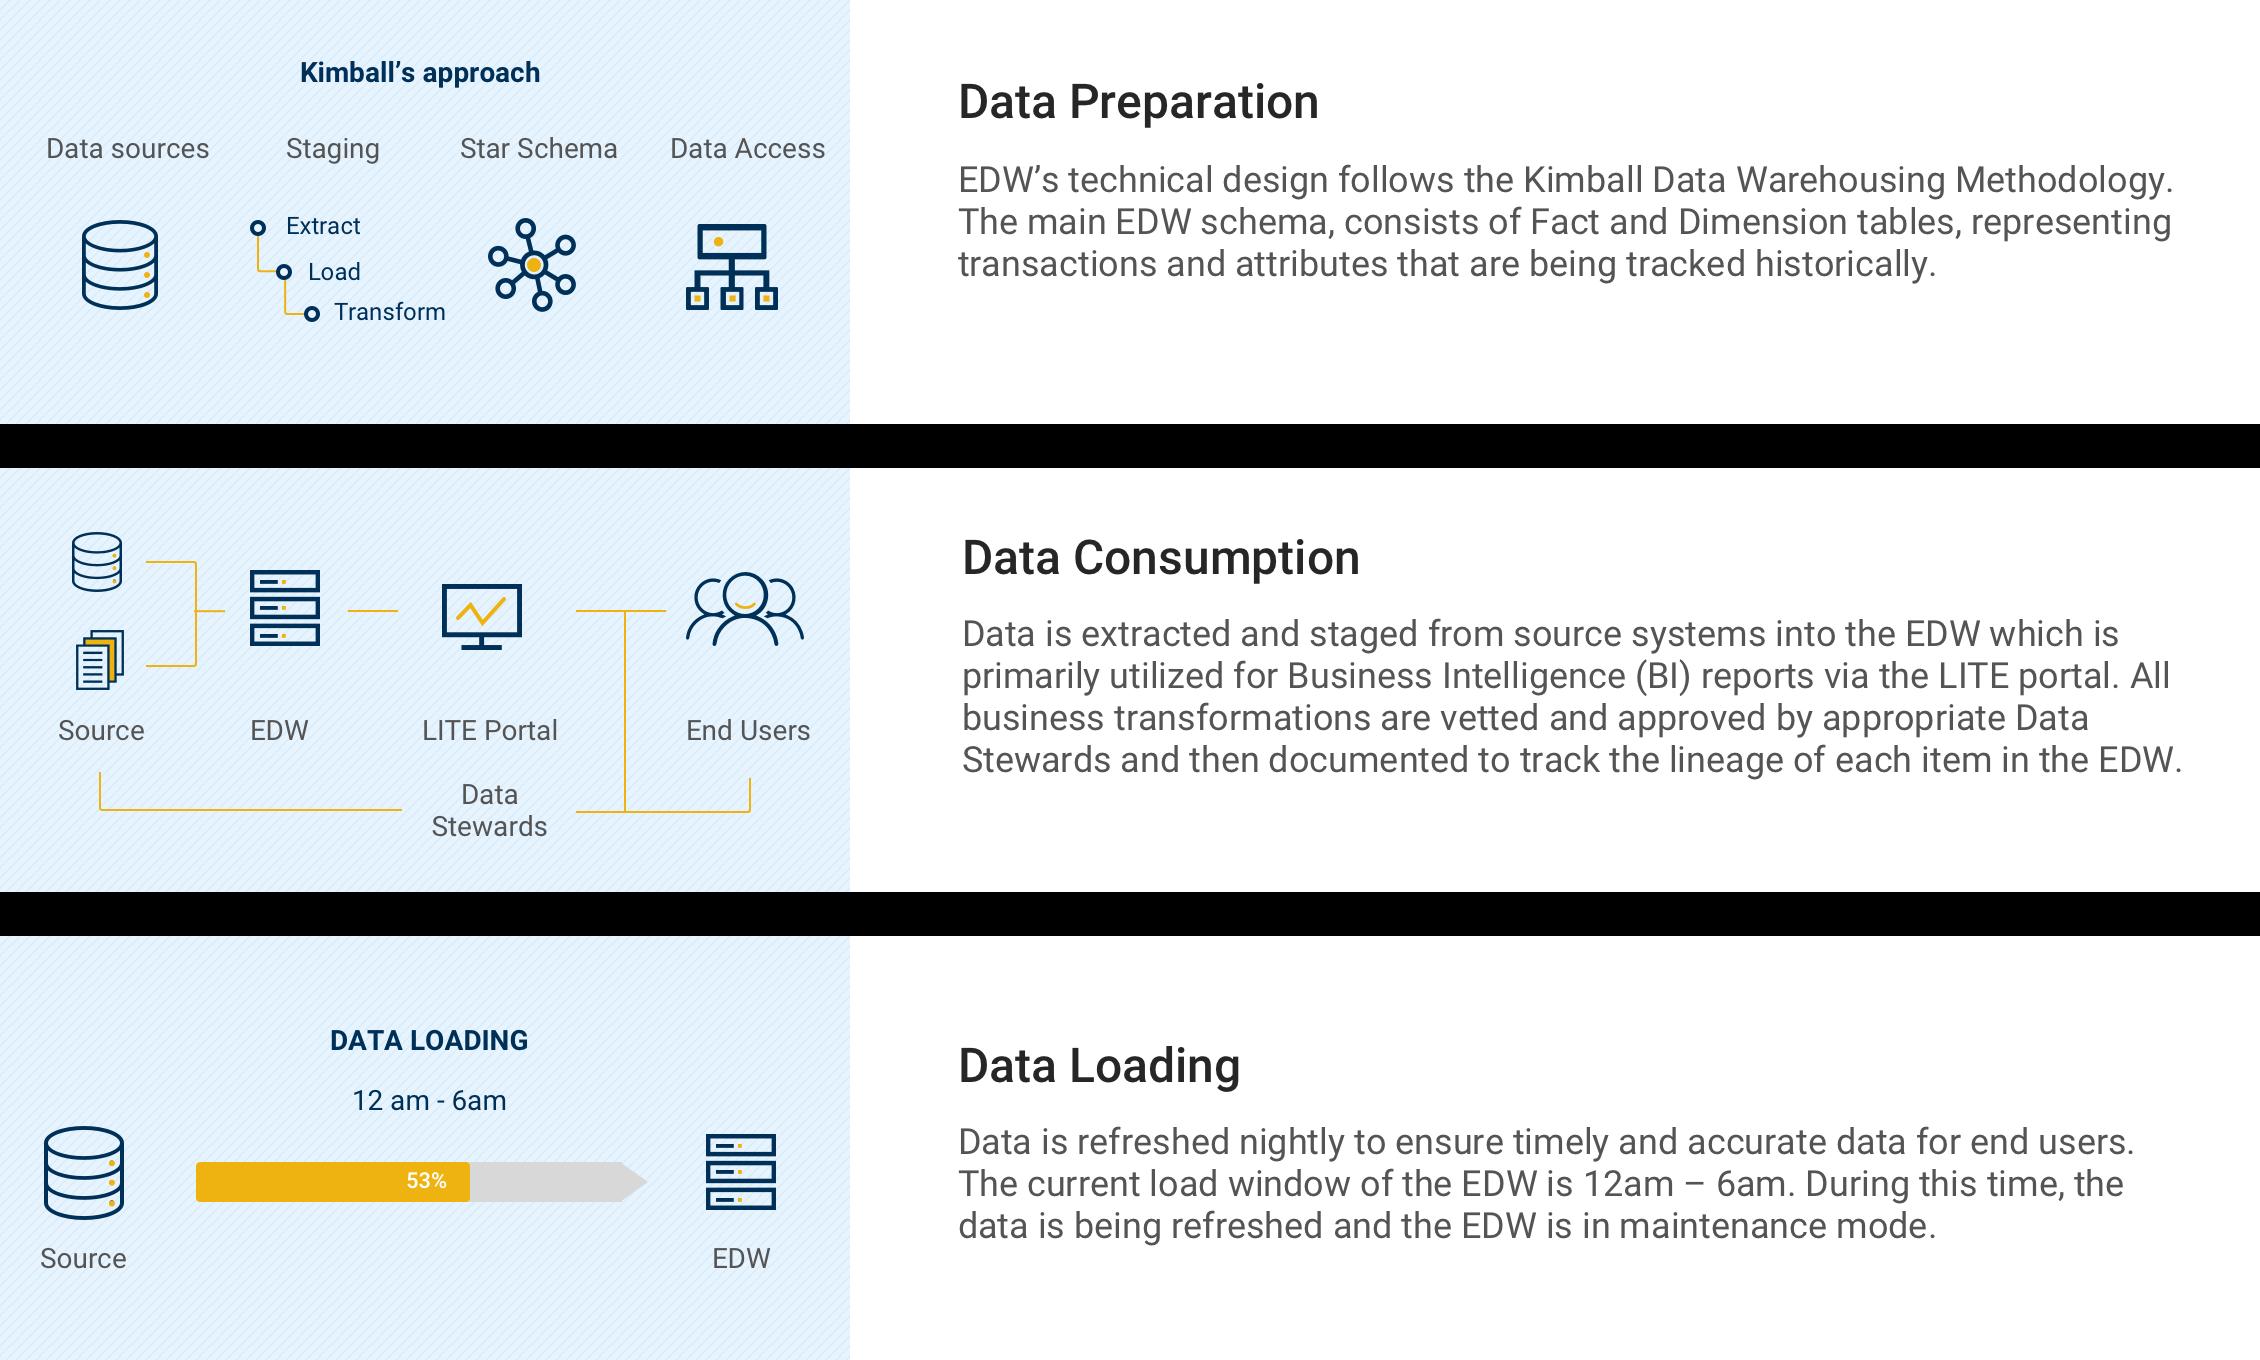 Illustration of how enterprise data warehouse works including data preparation, data consumption and data loading.